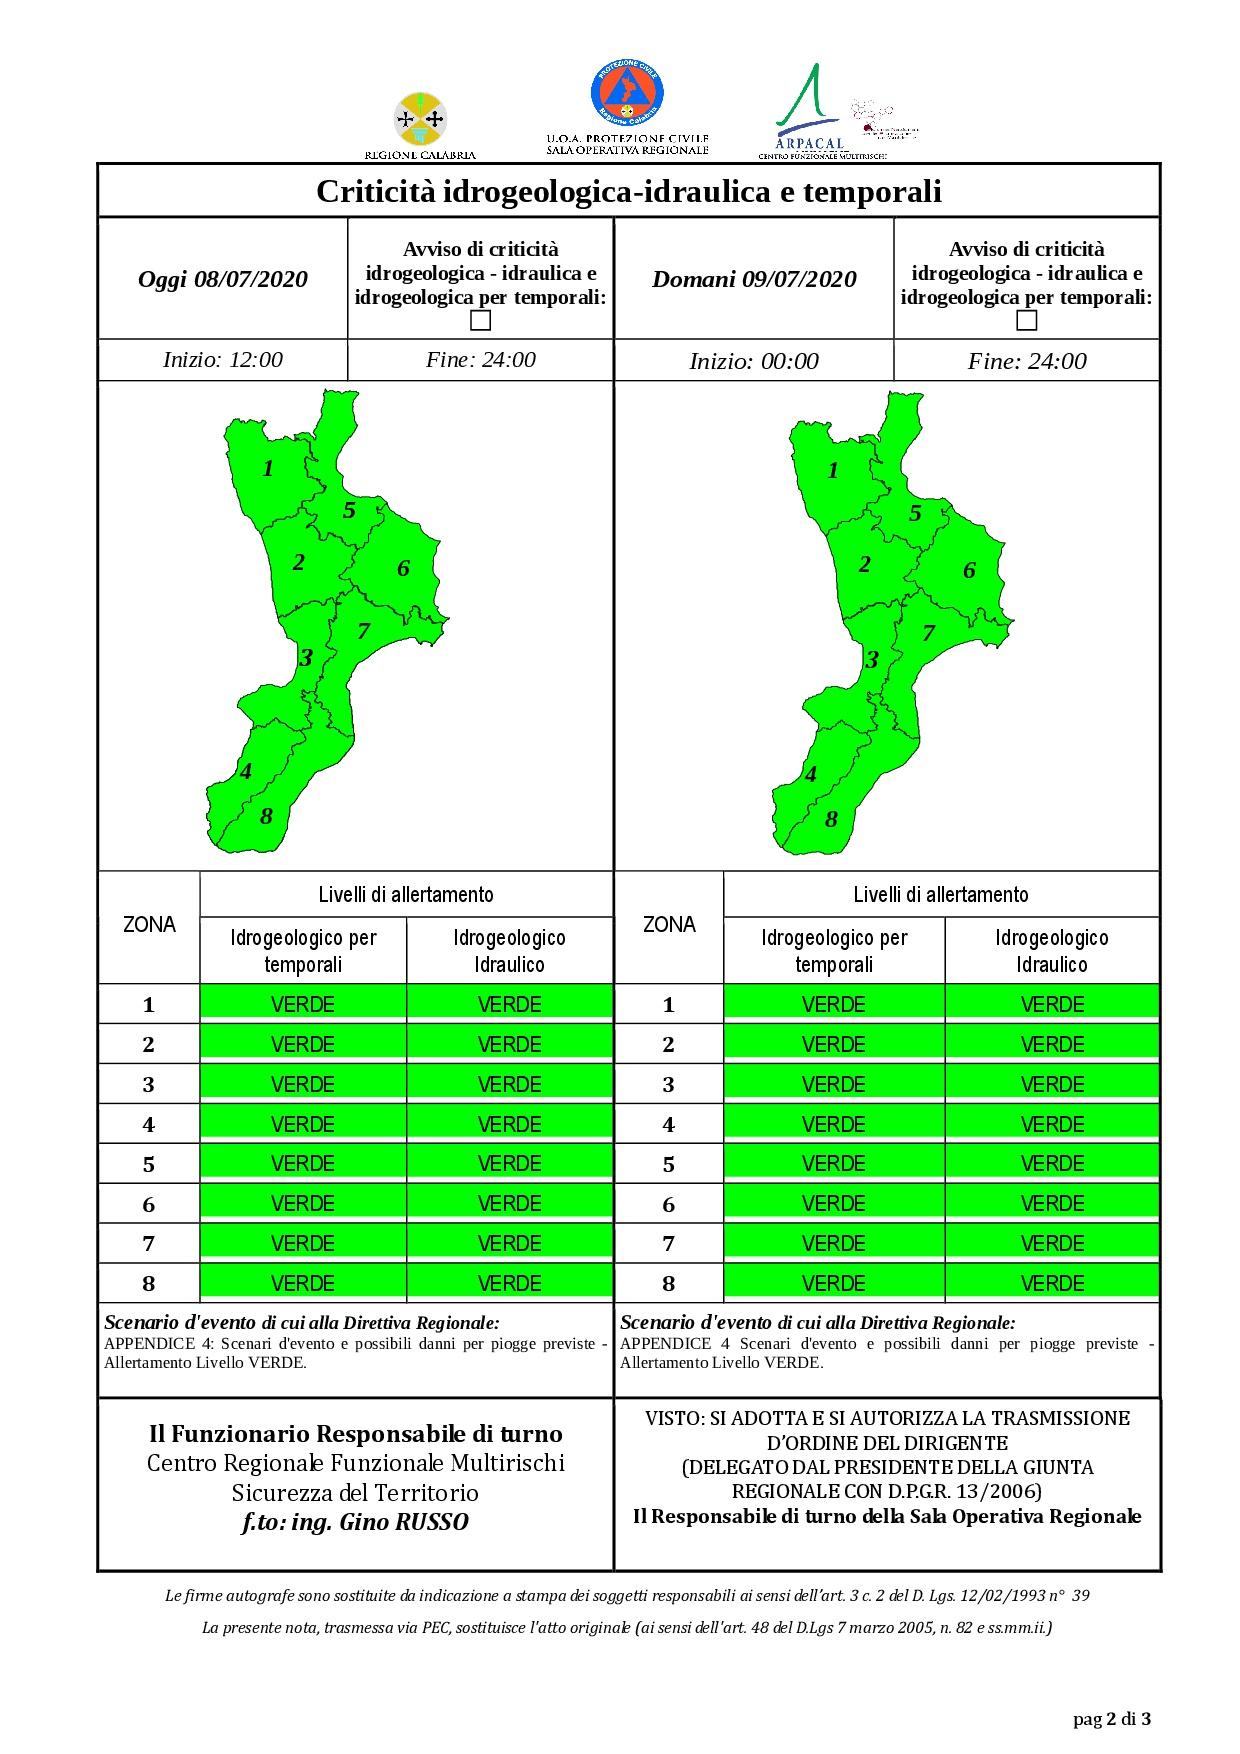 Criticità idrogeologica-idraulica e temporali in Calabria 08-07-2020